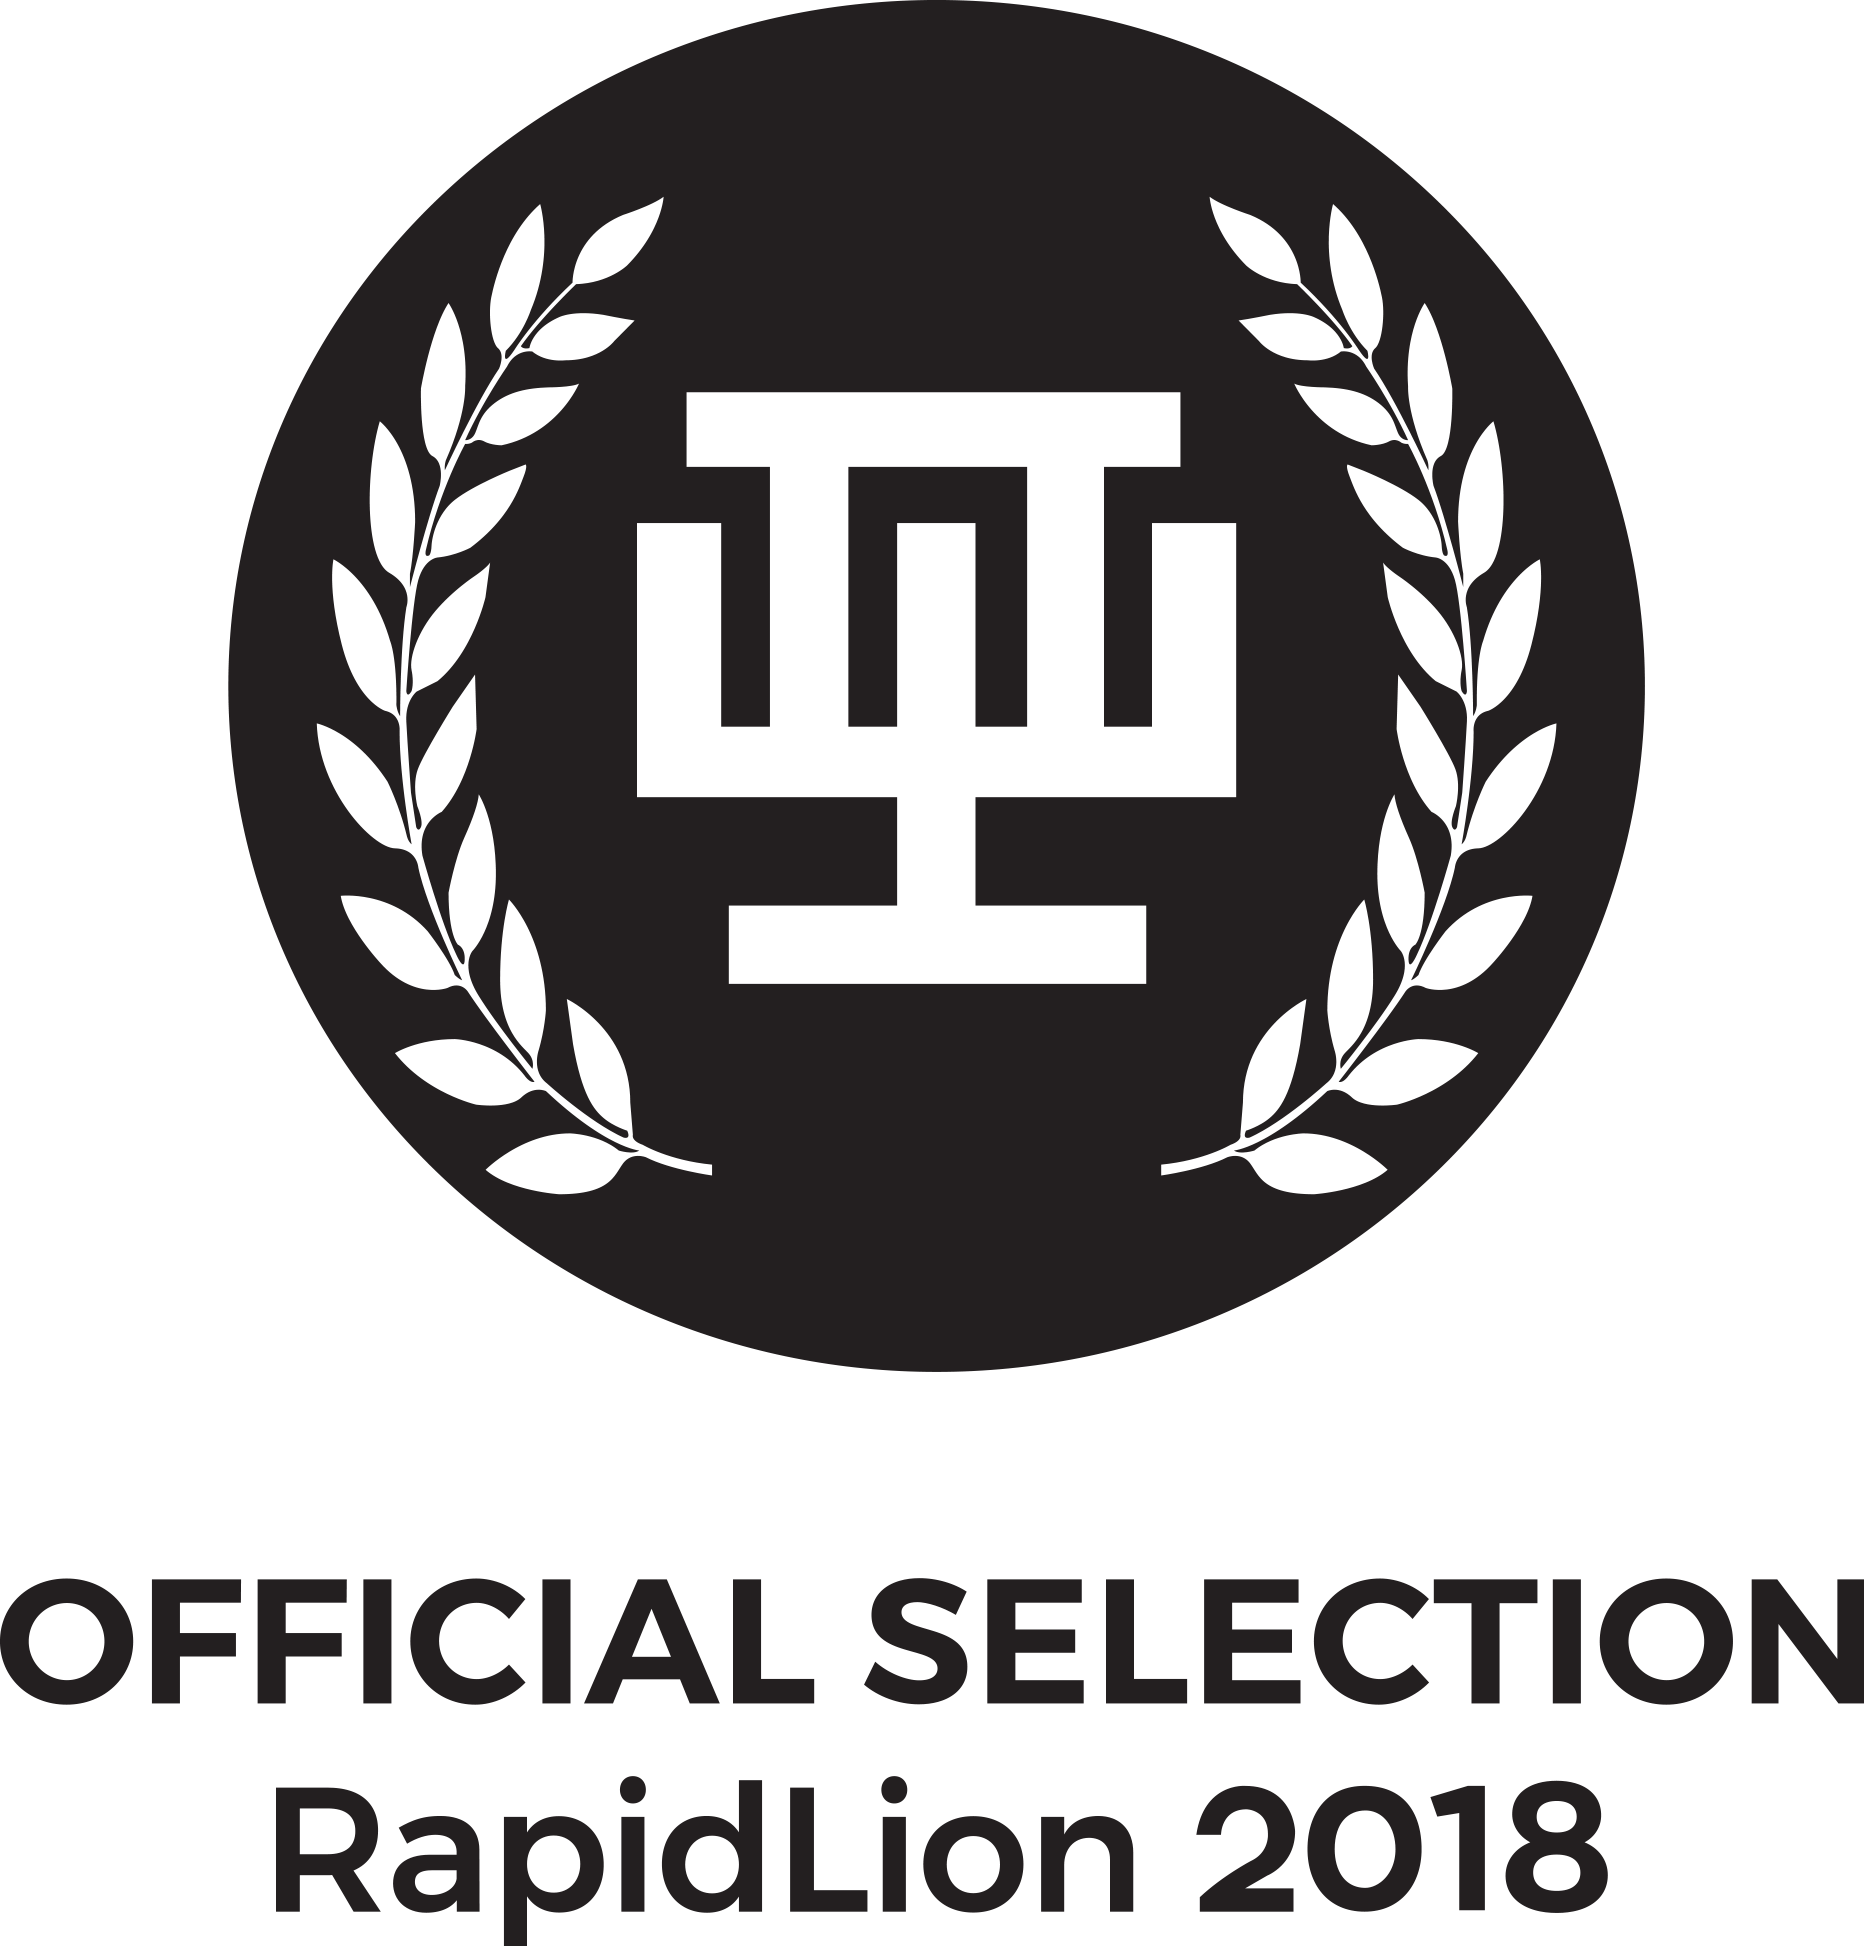 OFFICIAL SELECTION  EMBLEM 2018.png